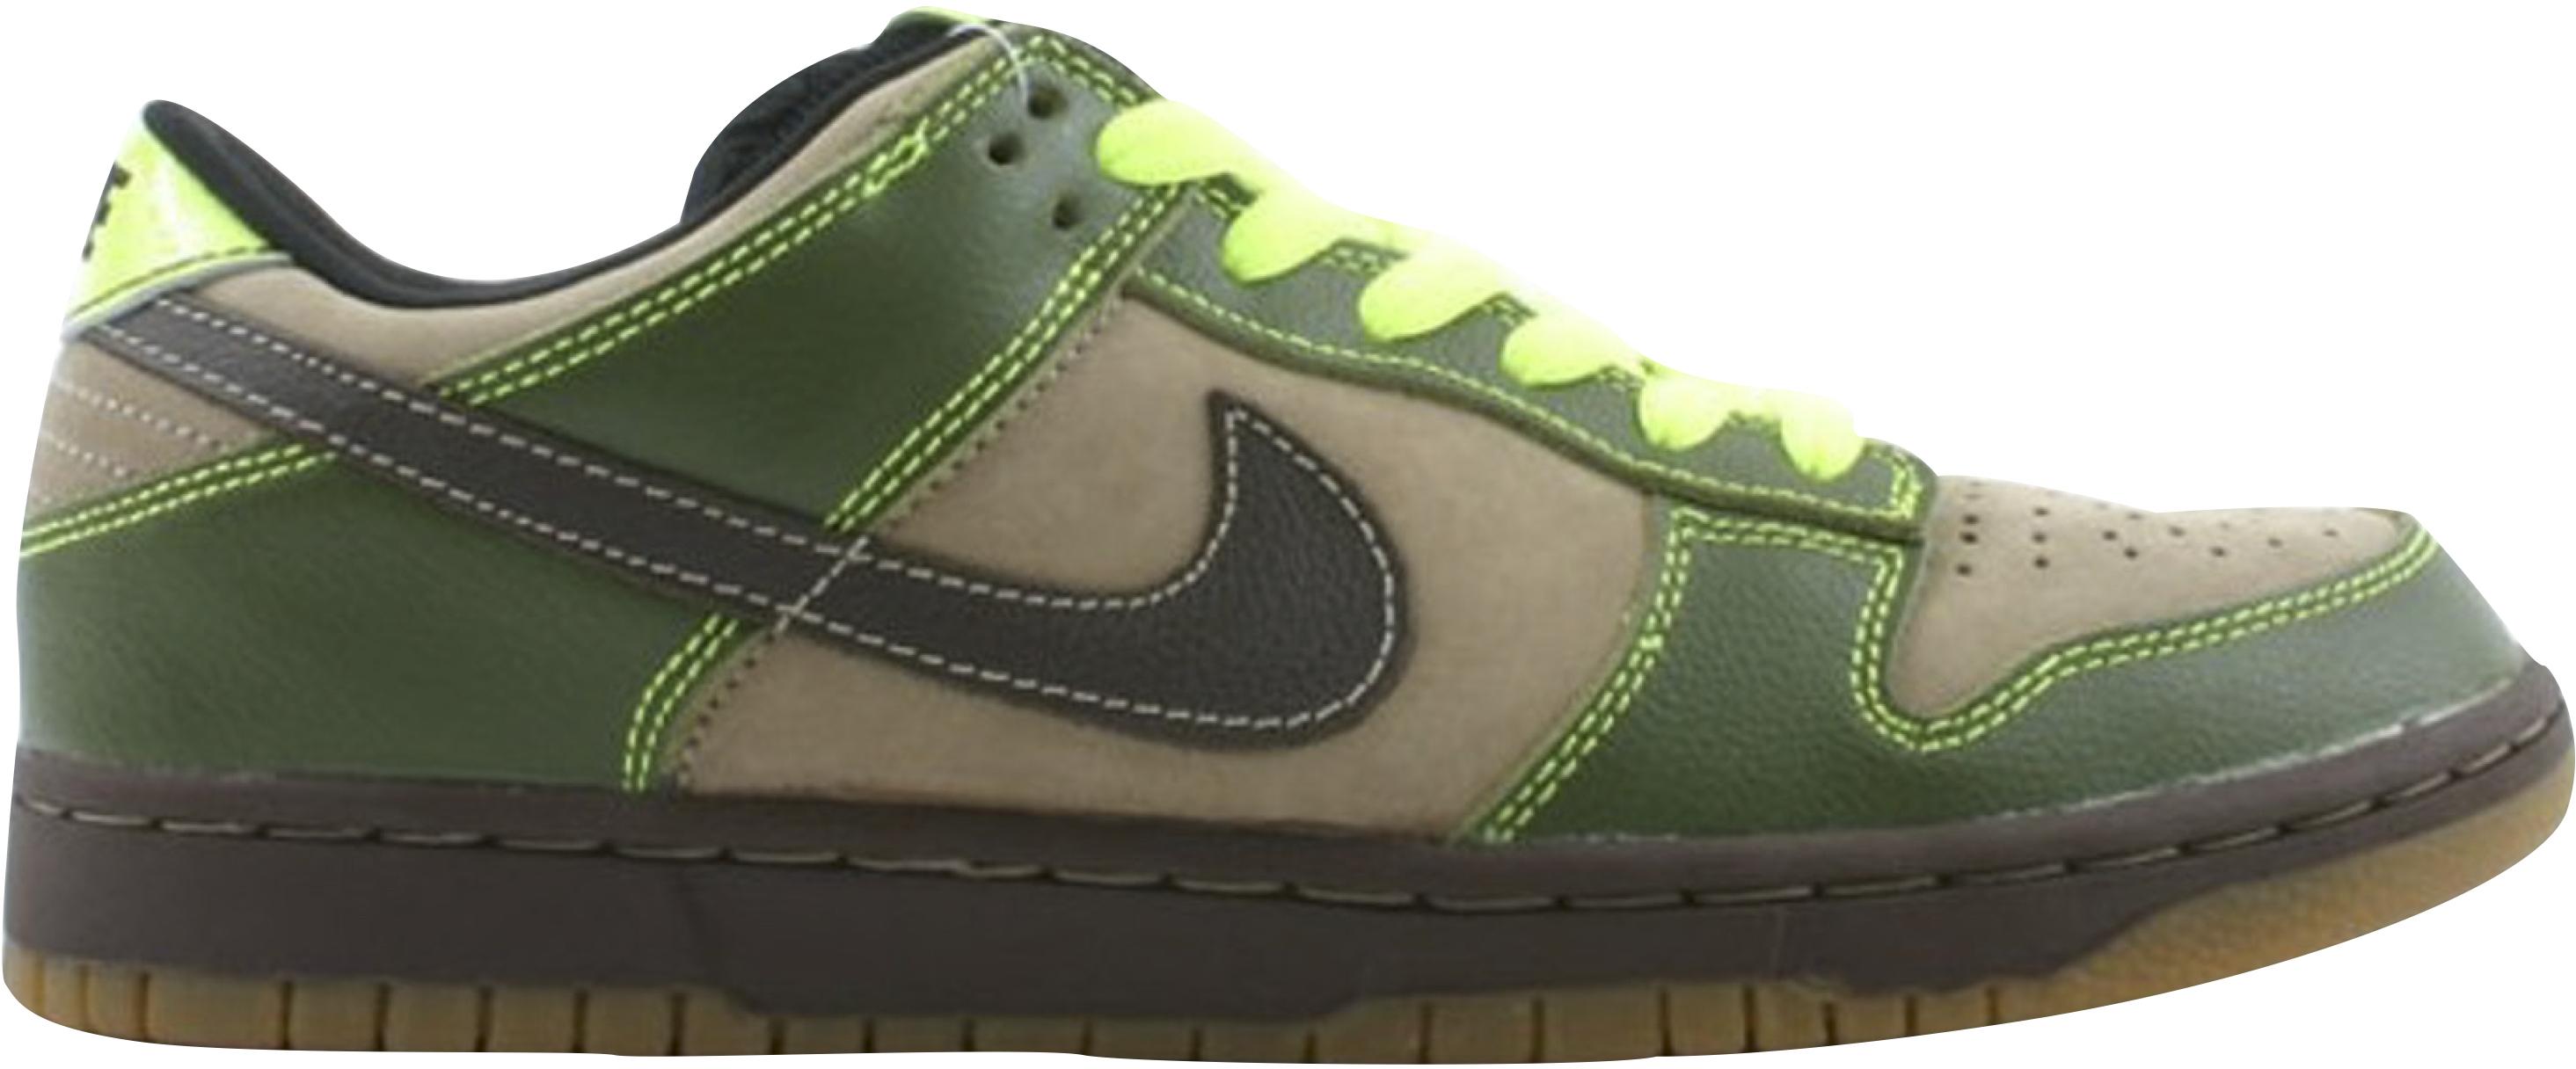 Boutique en vente Footlocker pas cher Nike Sb Jedi 10.5 sDNvstC